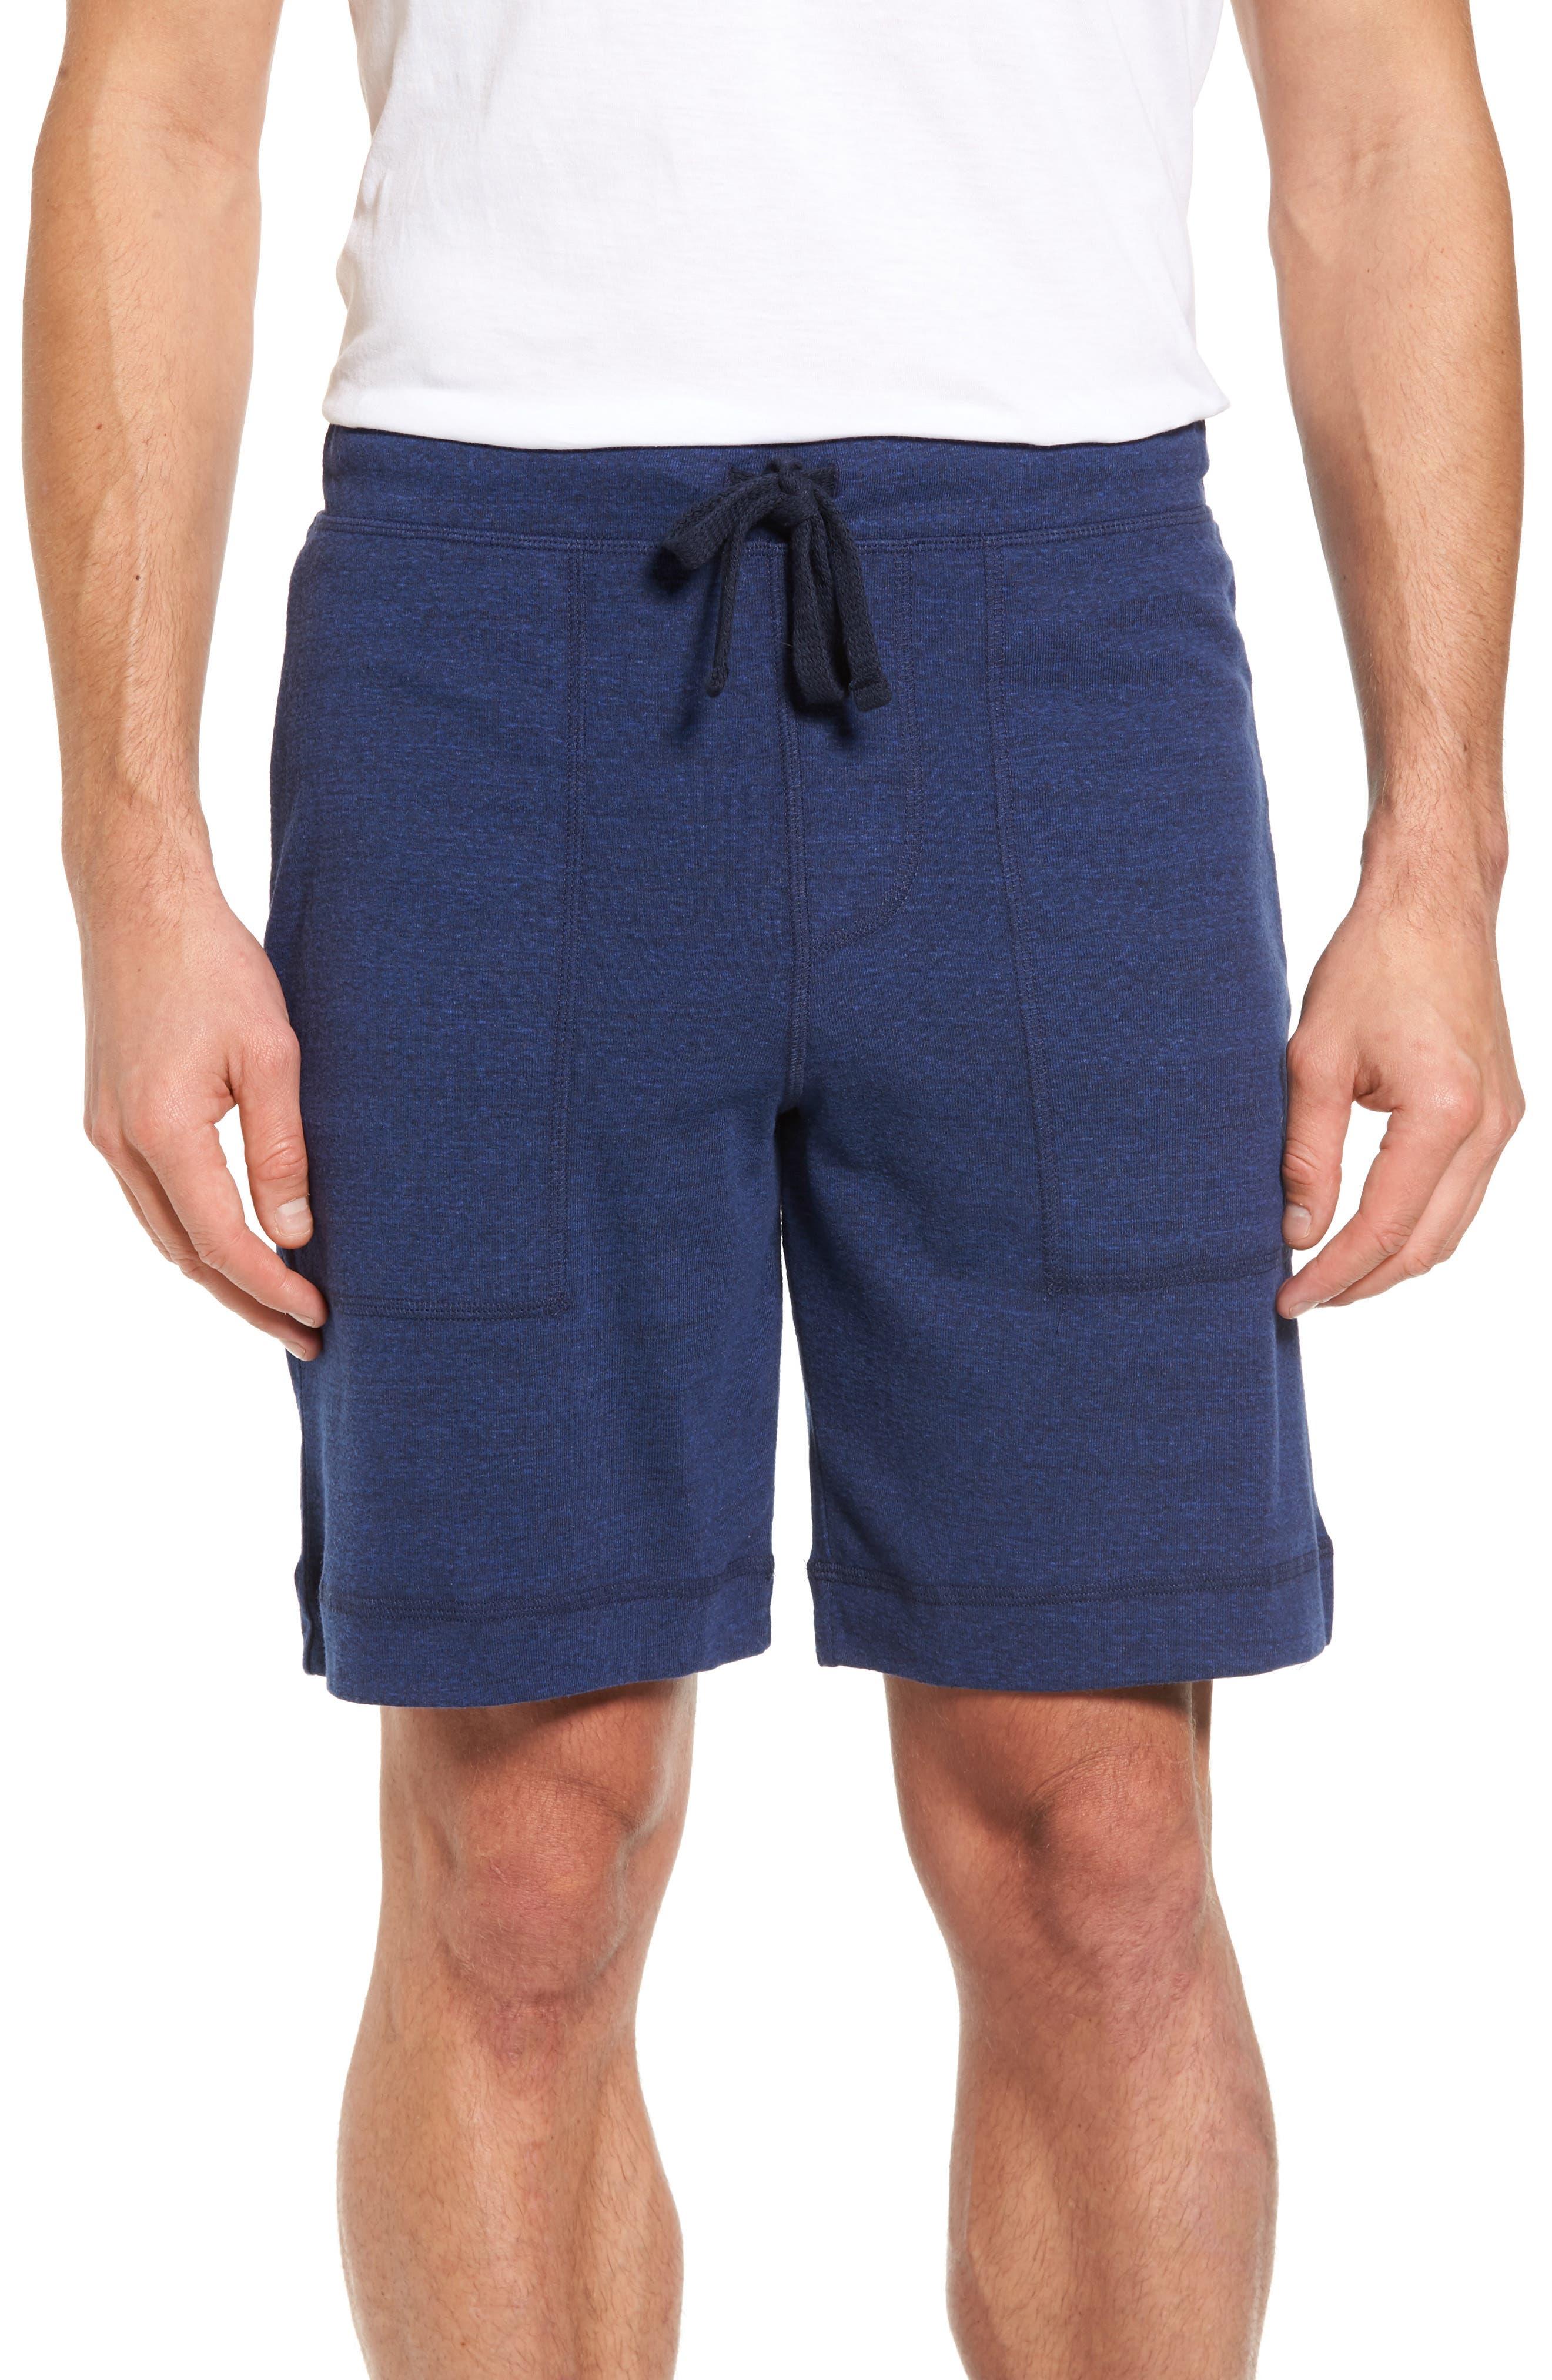 Revival Relaxed Knit Shorts,                             Main thumbnail 1, color,                             Navy Triblend